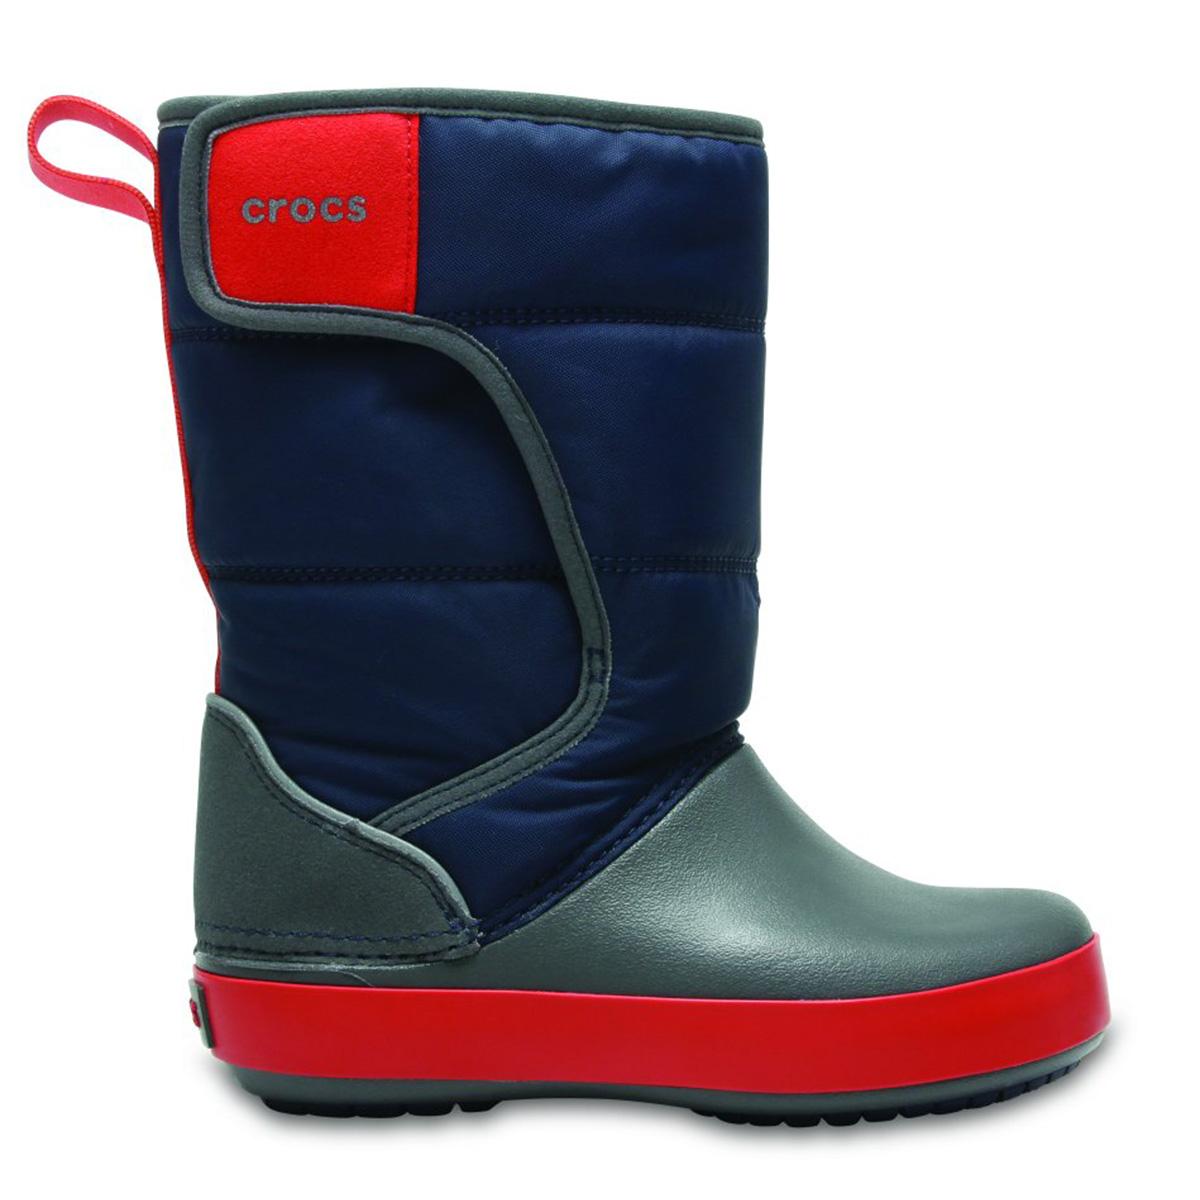 LodgePoint Snow Boot K - Lacivert/Barut rengi